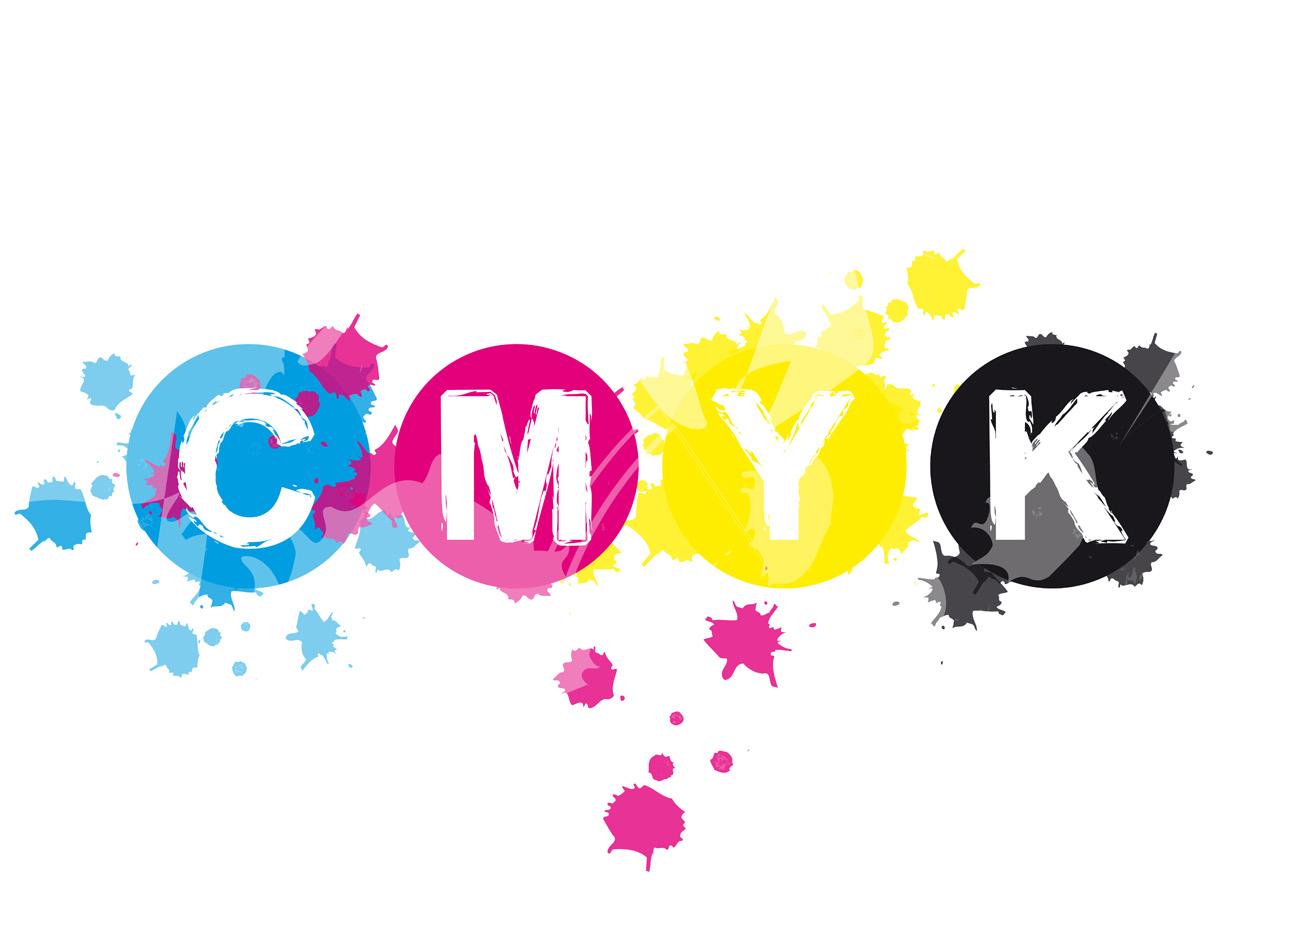 cmyk wallpaper 9 of - photo #44